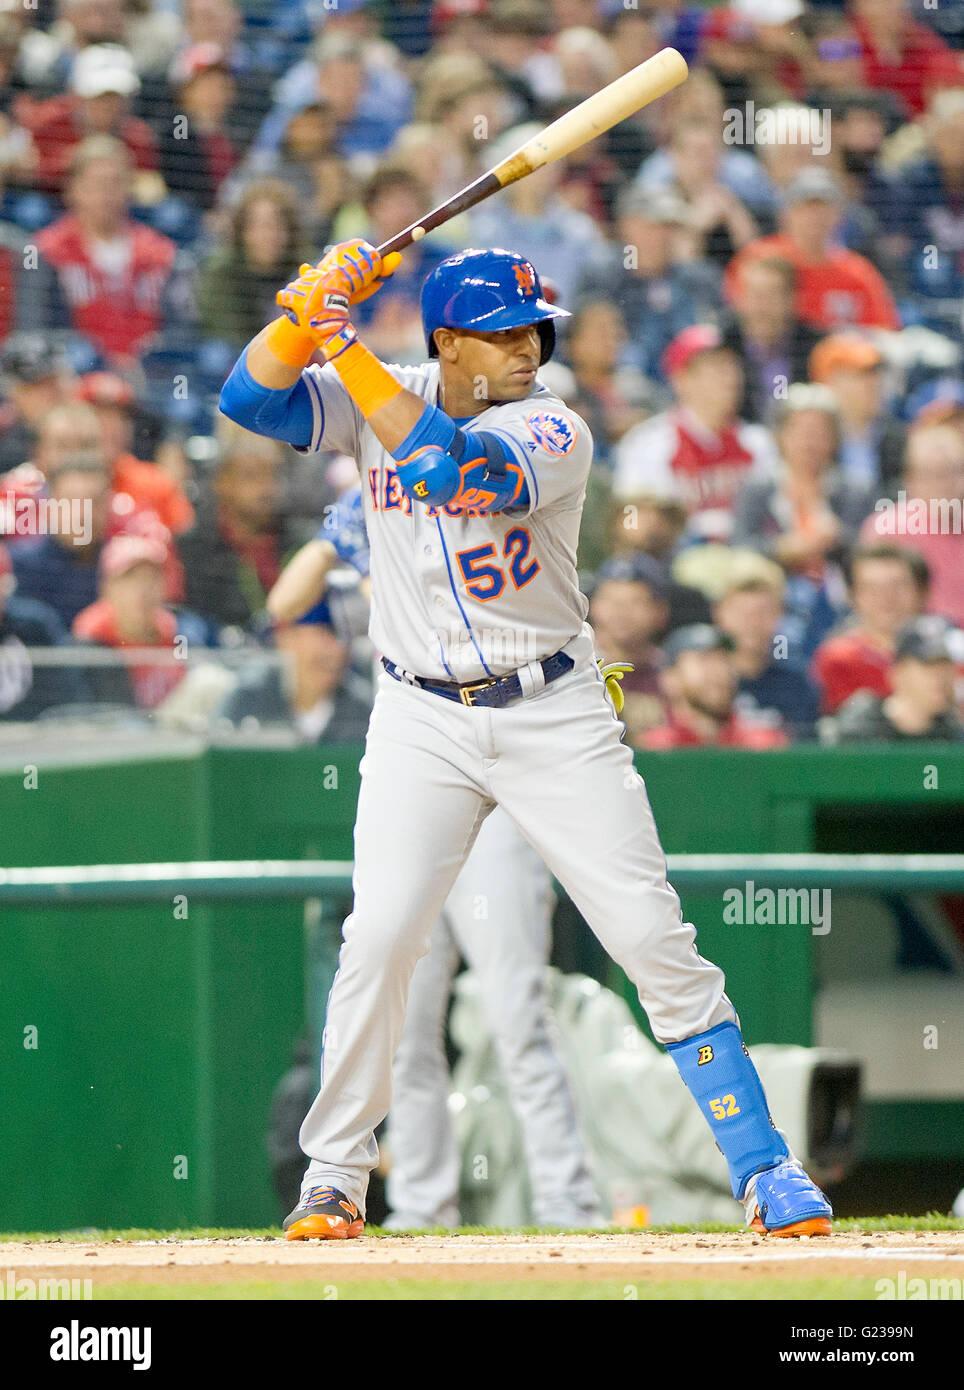 new styles 6c926 57e9c New York Mets center fielder Yoenis Cespedes (52) bats in ...